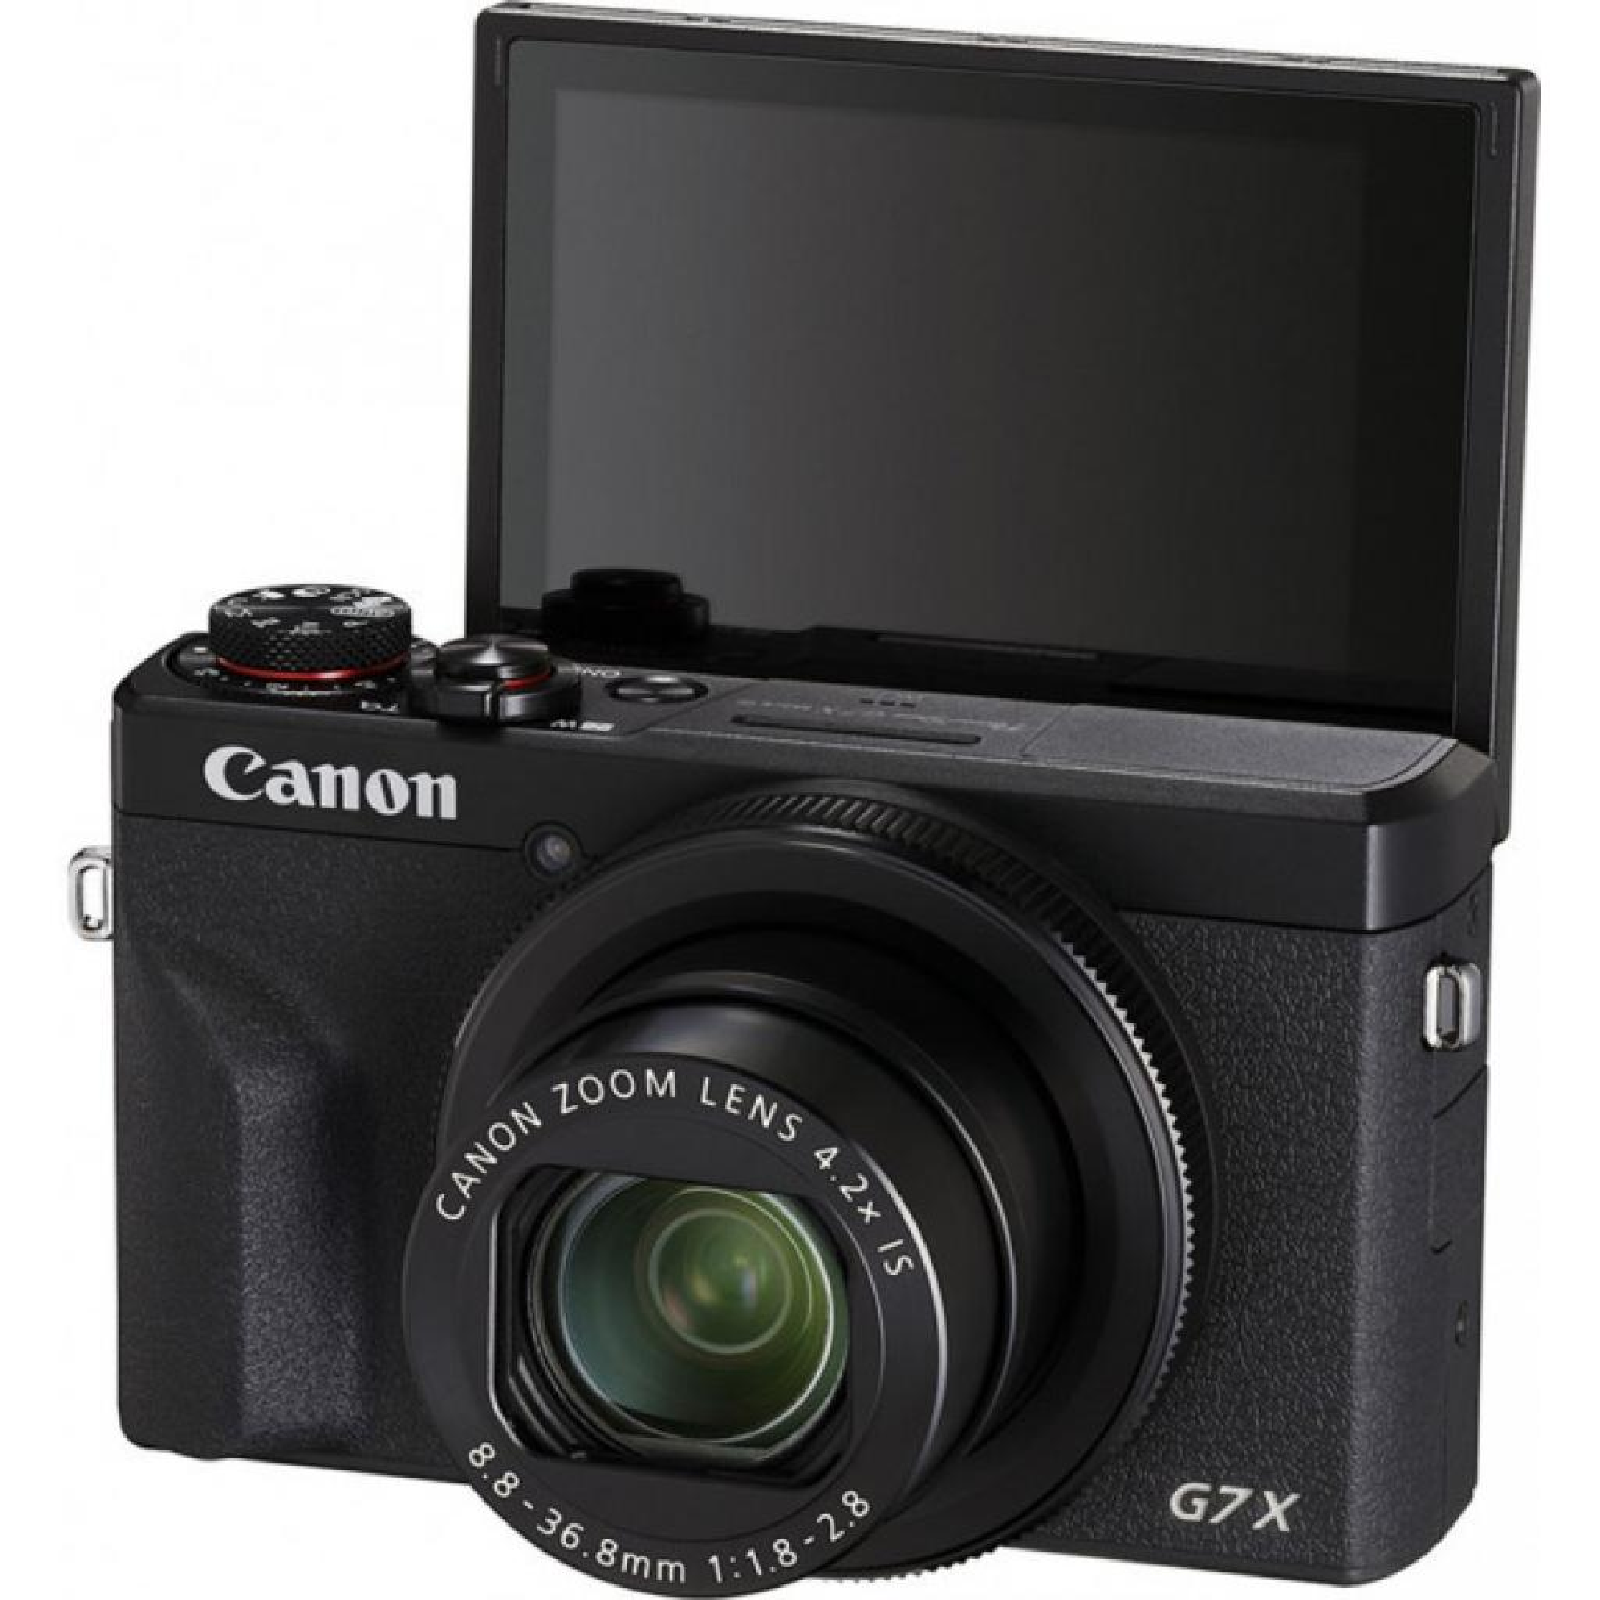 Цифровой фотоаппарат Canon Powershot G7 X Mark III Black (3637C013) изображение 4